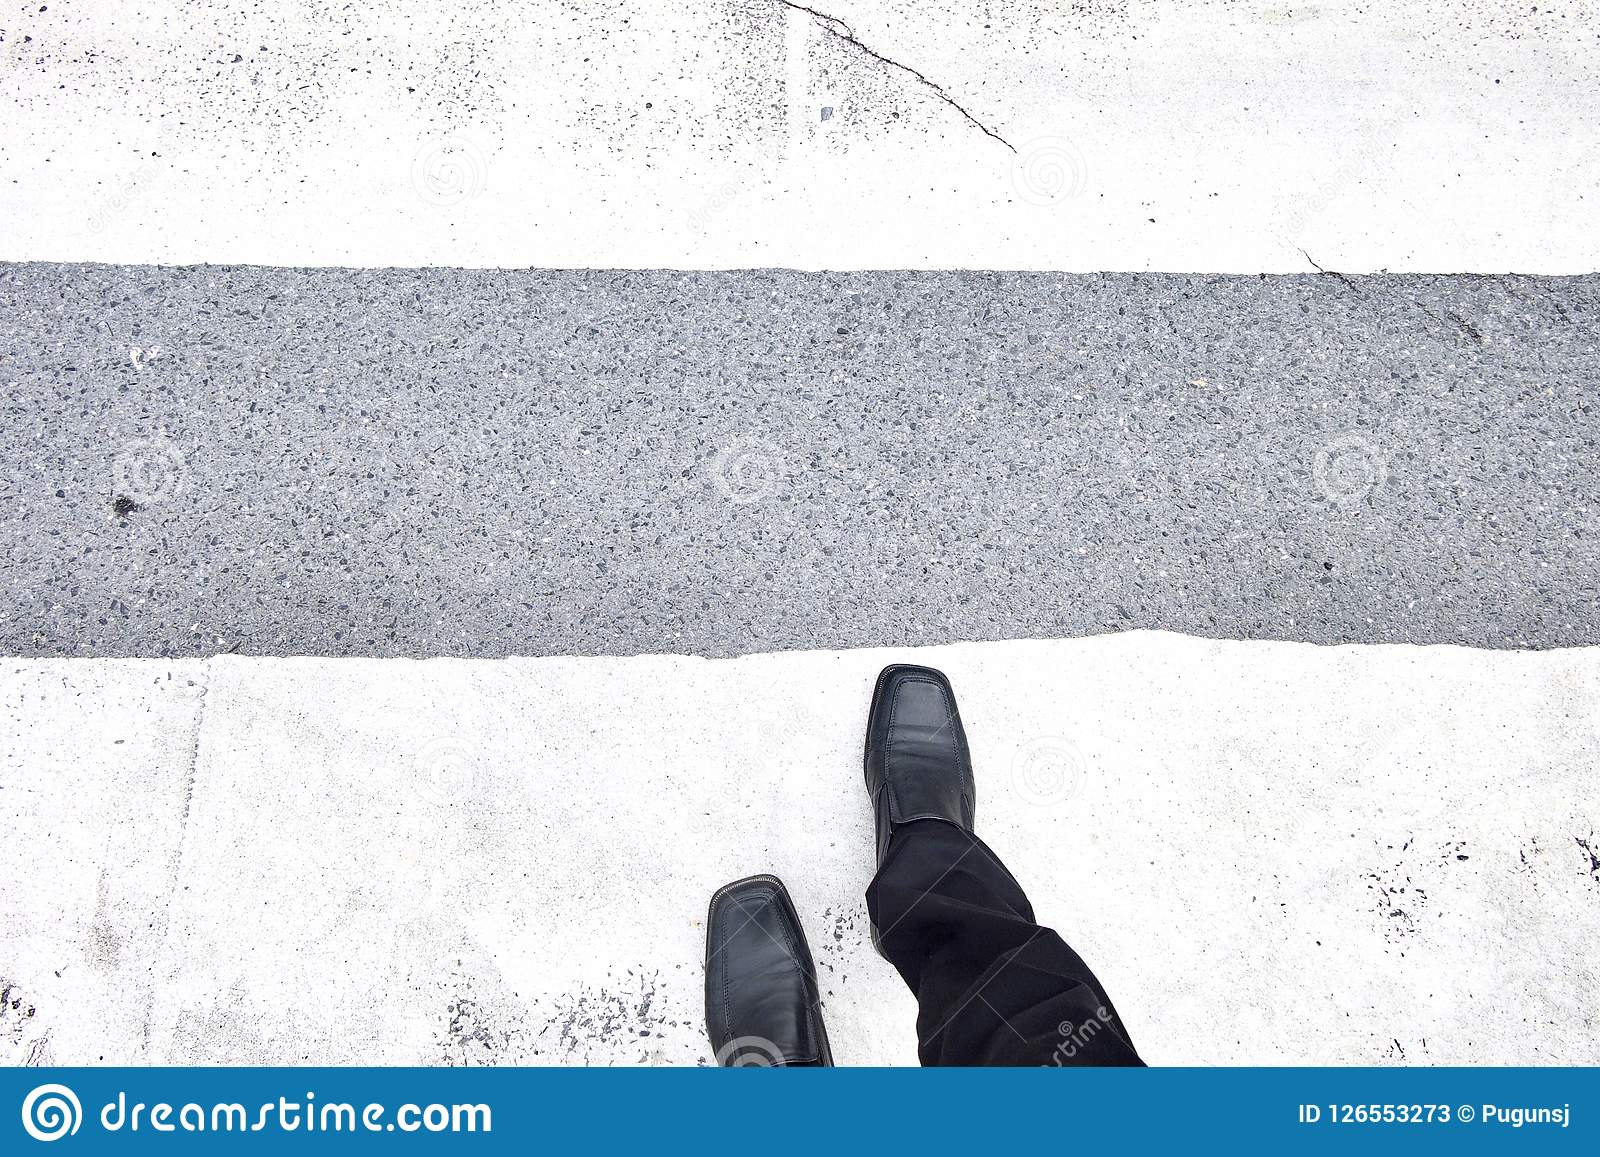 Businessman walking across the crosswalk. Black leather shoes and black slacks. Top view.